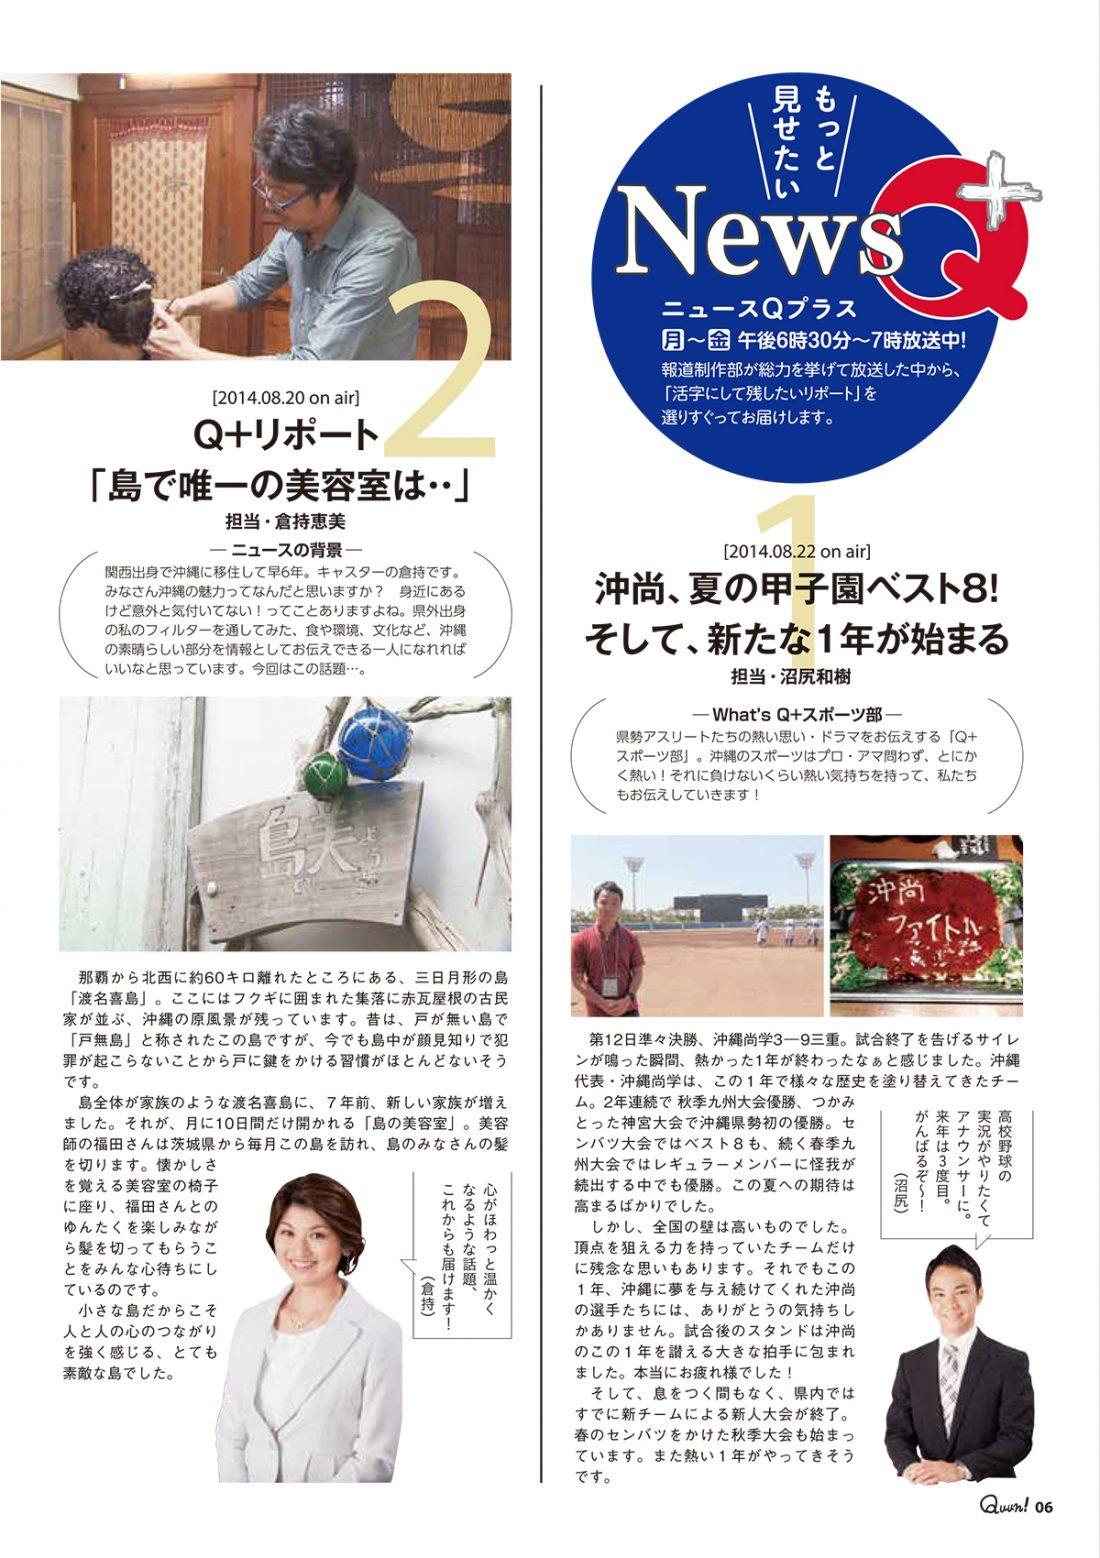 http://www.qab.co.jp/qgoro/wp-content/uploads/quun_0208-1100x1558.jpg